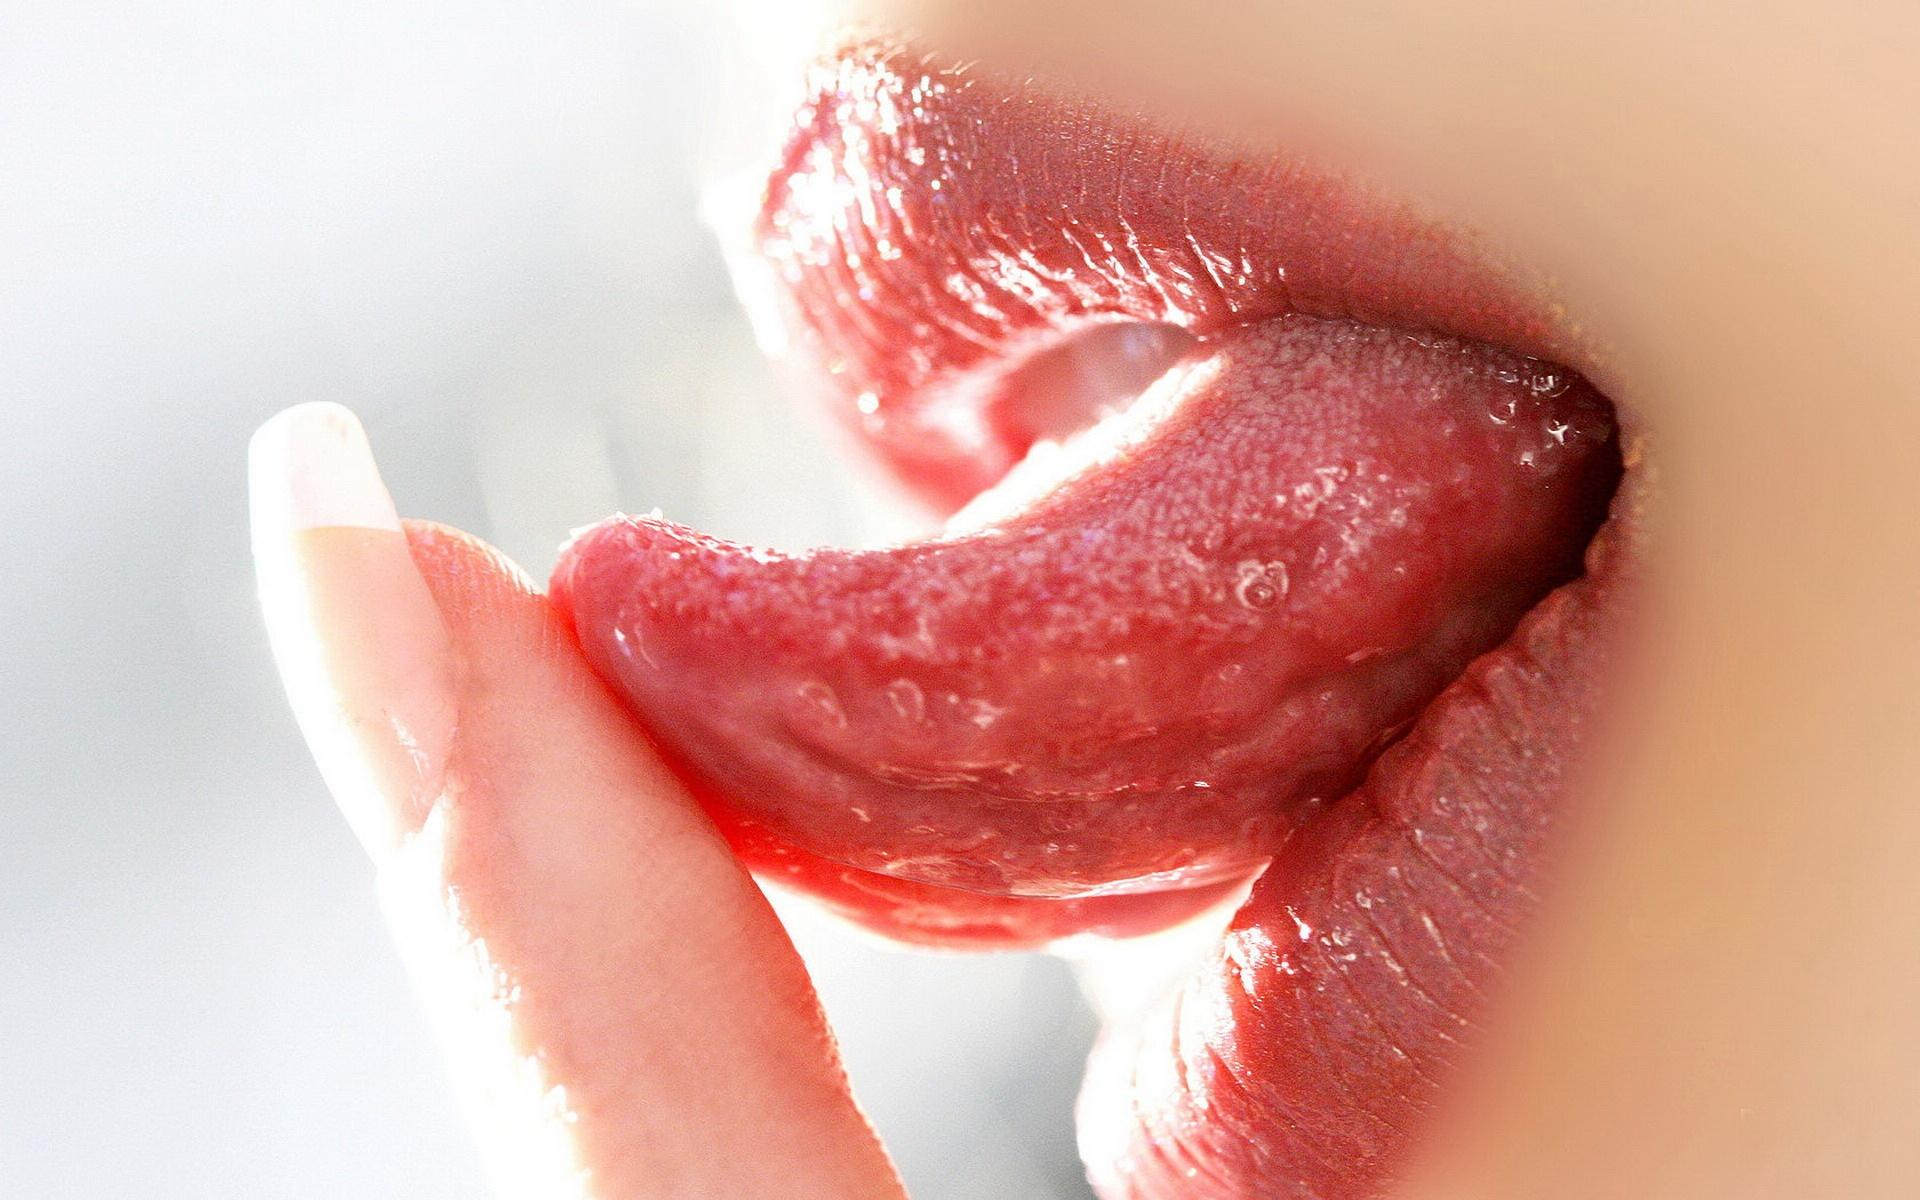 Awas! Pilek dan Sakit Terus-Menerus Di Mulut Salah Satu Tanda Kanker Lidah